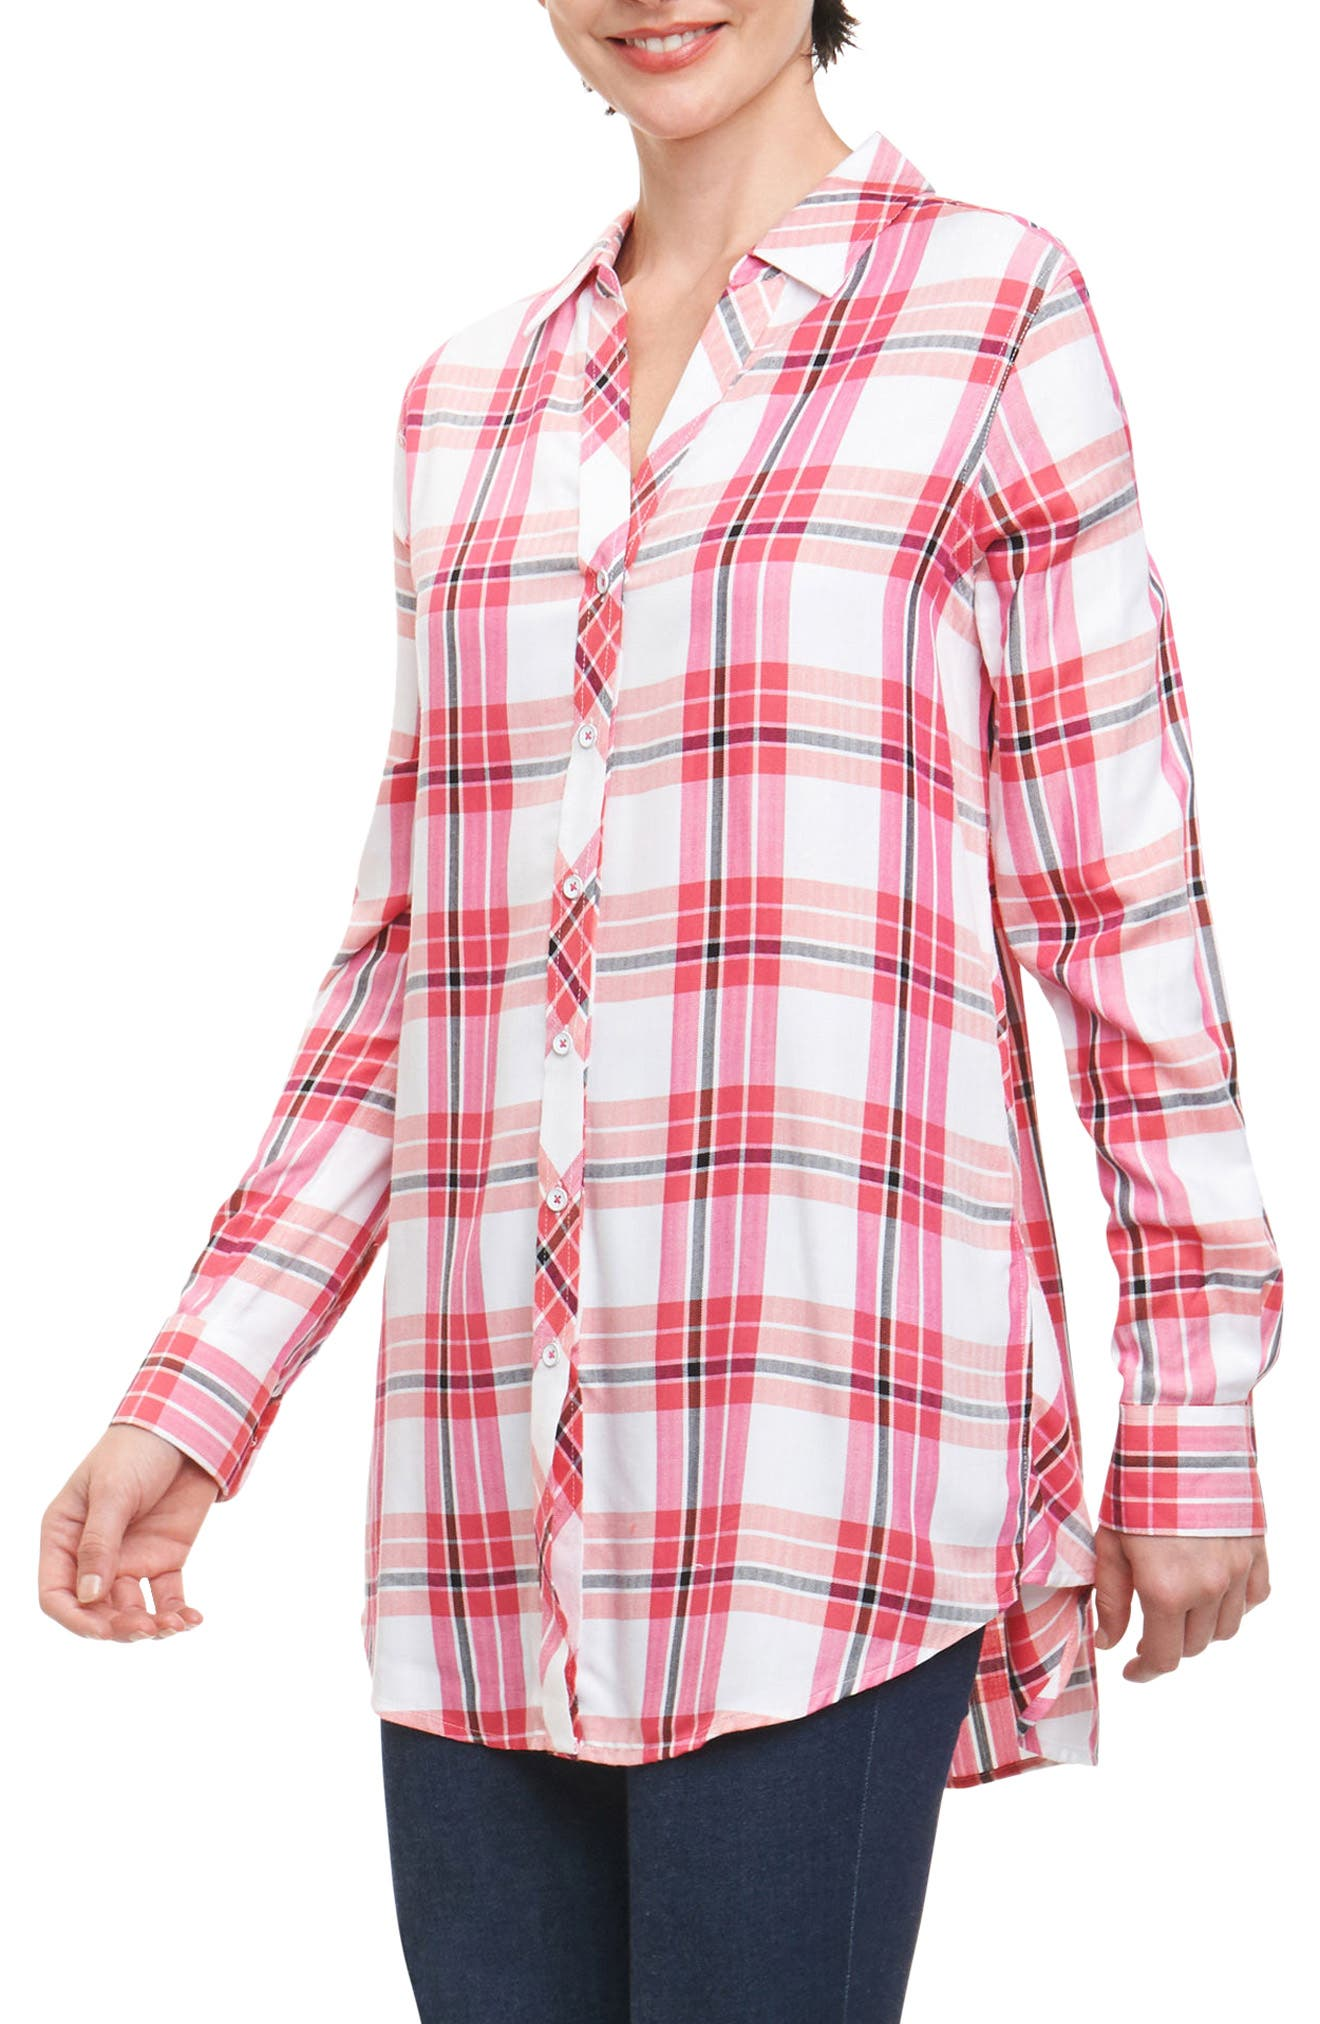 Fay Pinktini Plaid Shirt,                         Main,                         color, MULTI